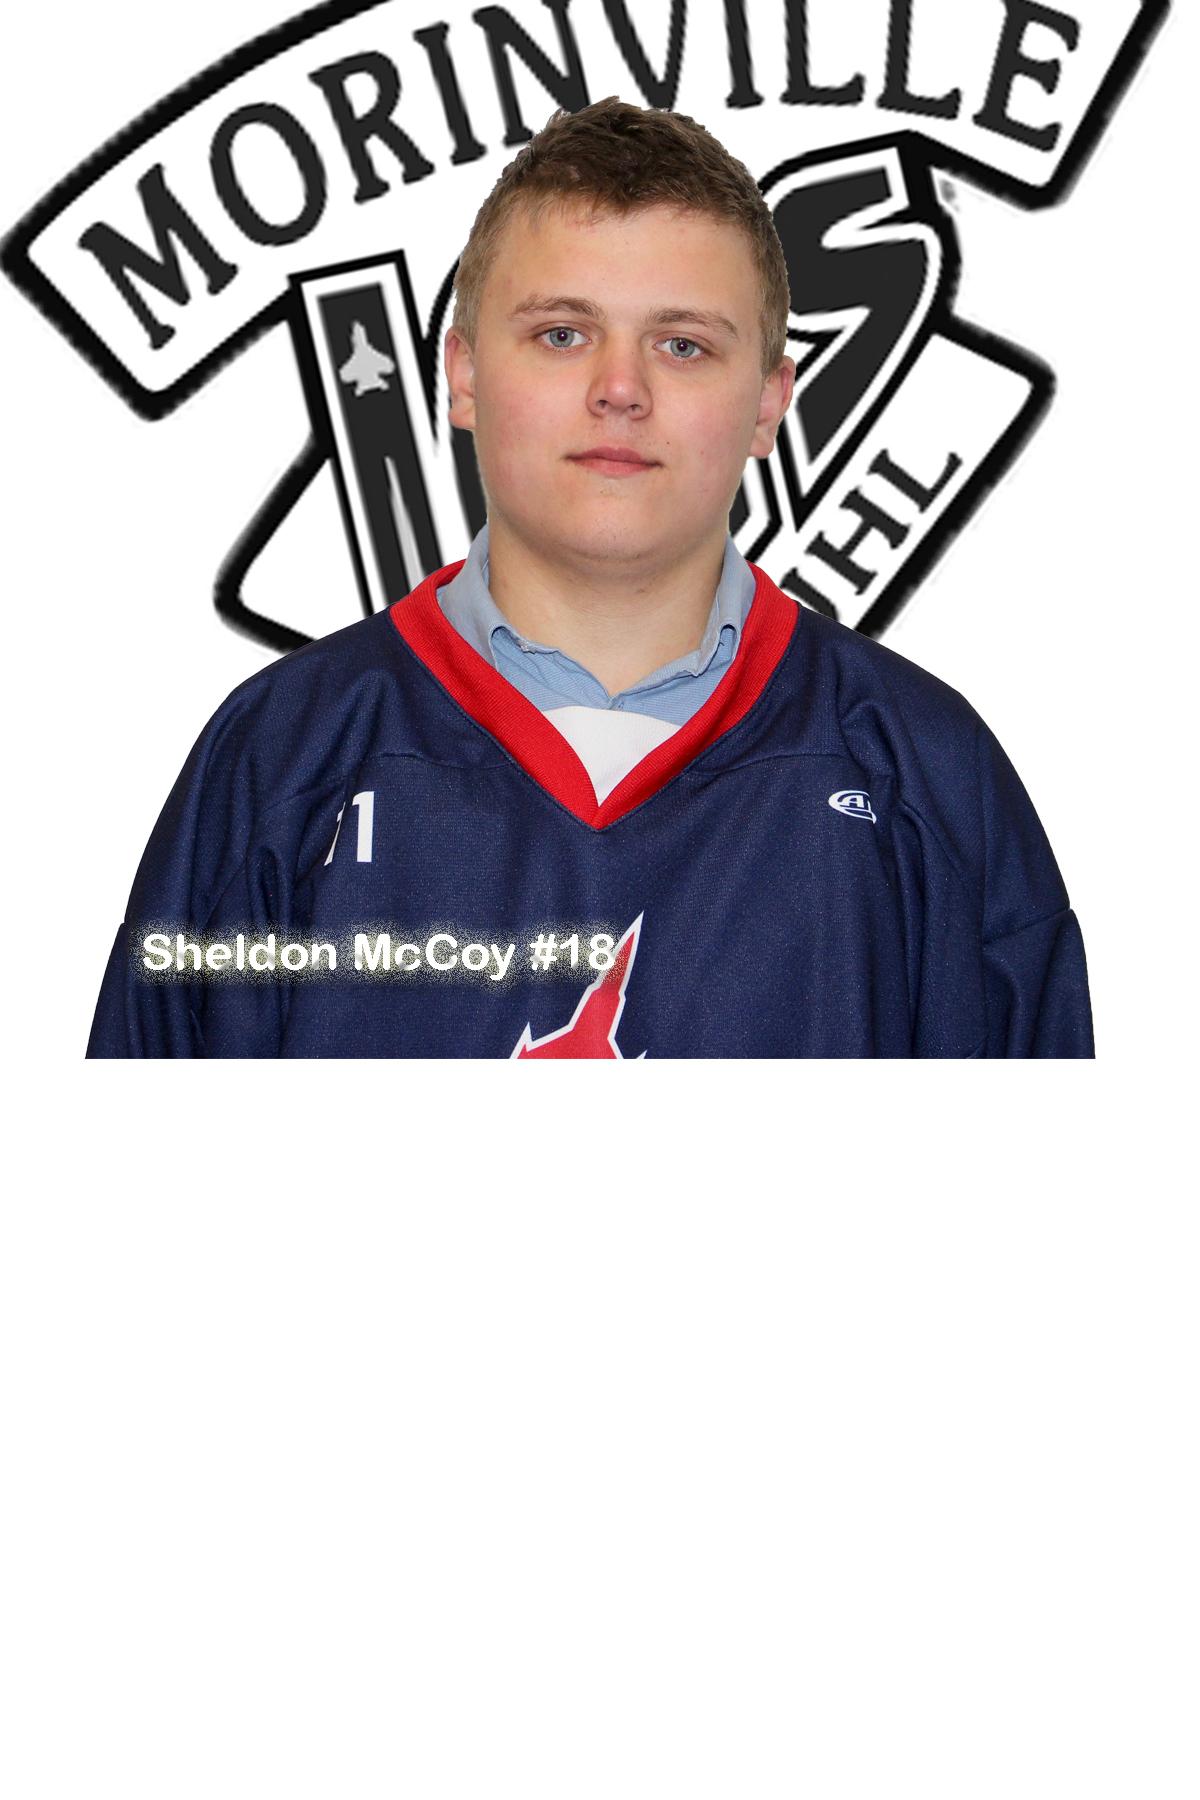 #18 Sheldon McCoy